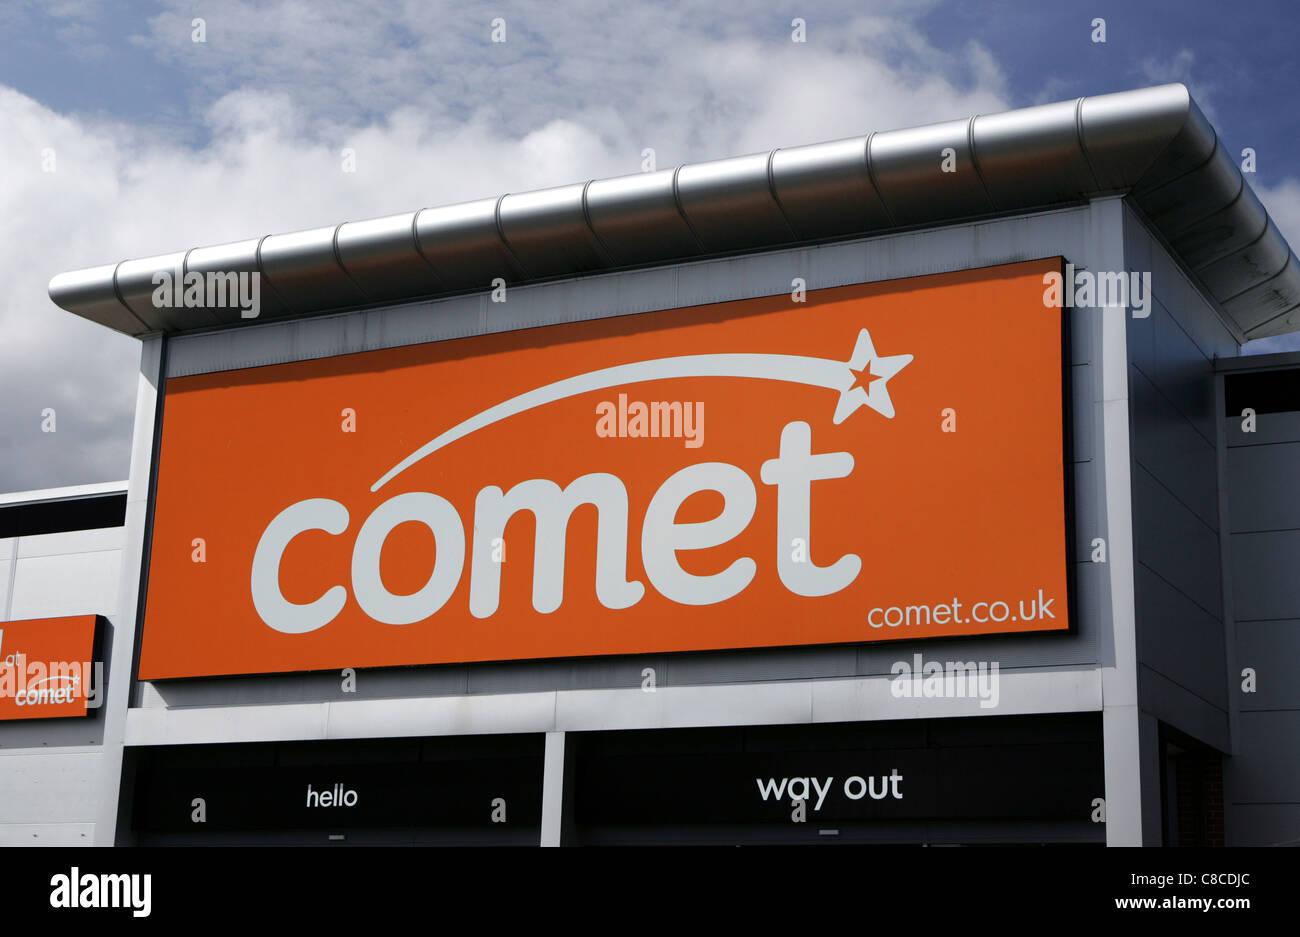 comet store fron uk - Stock Image